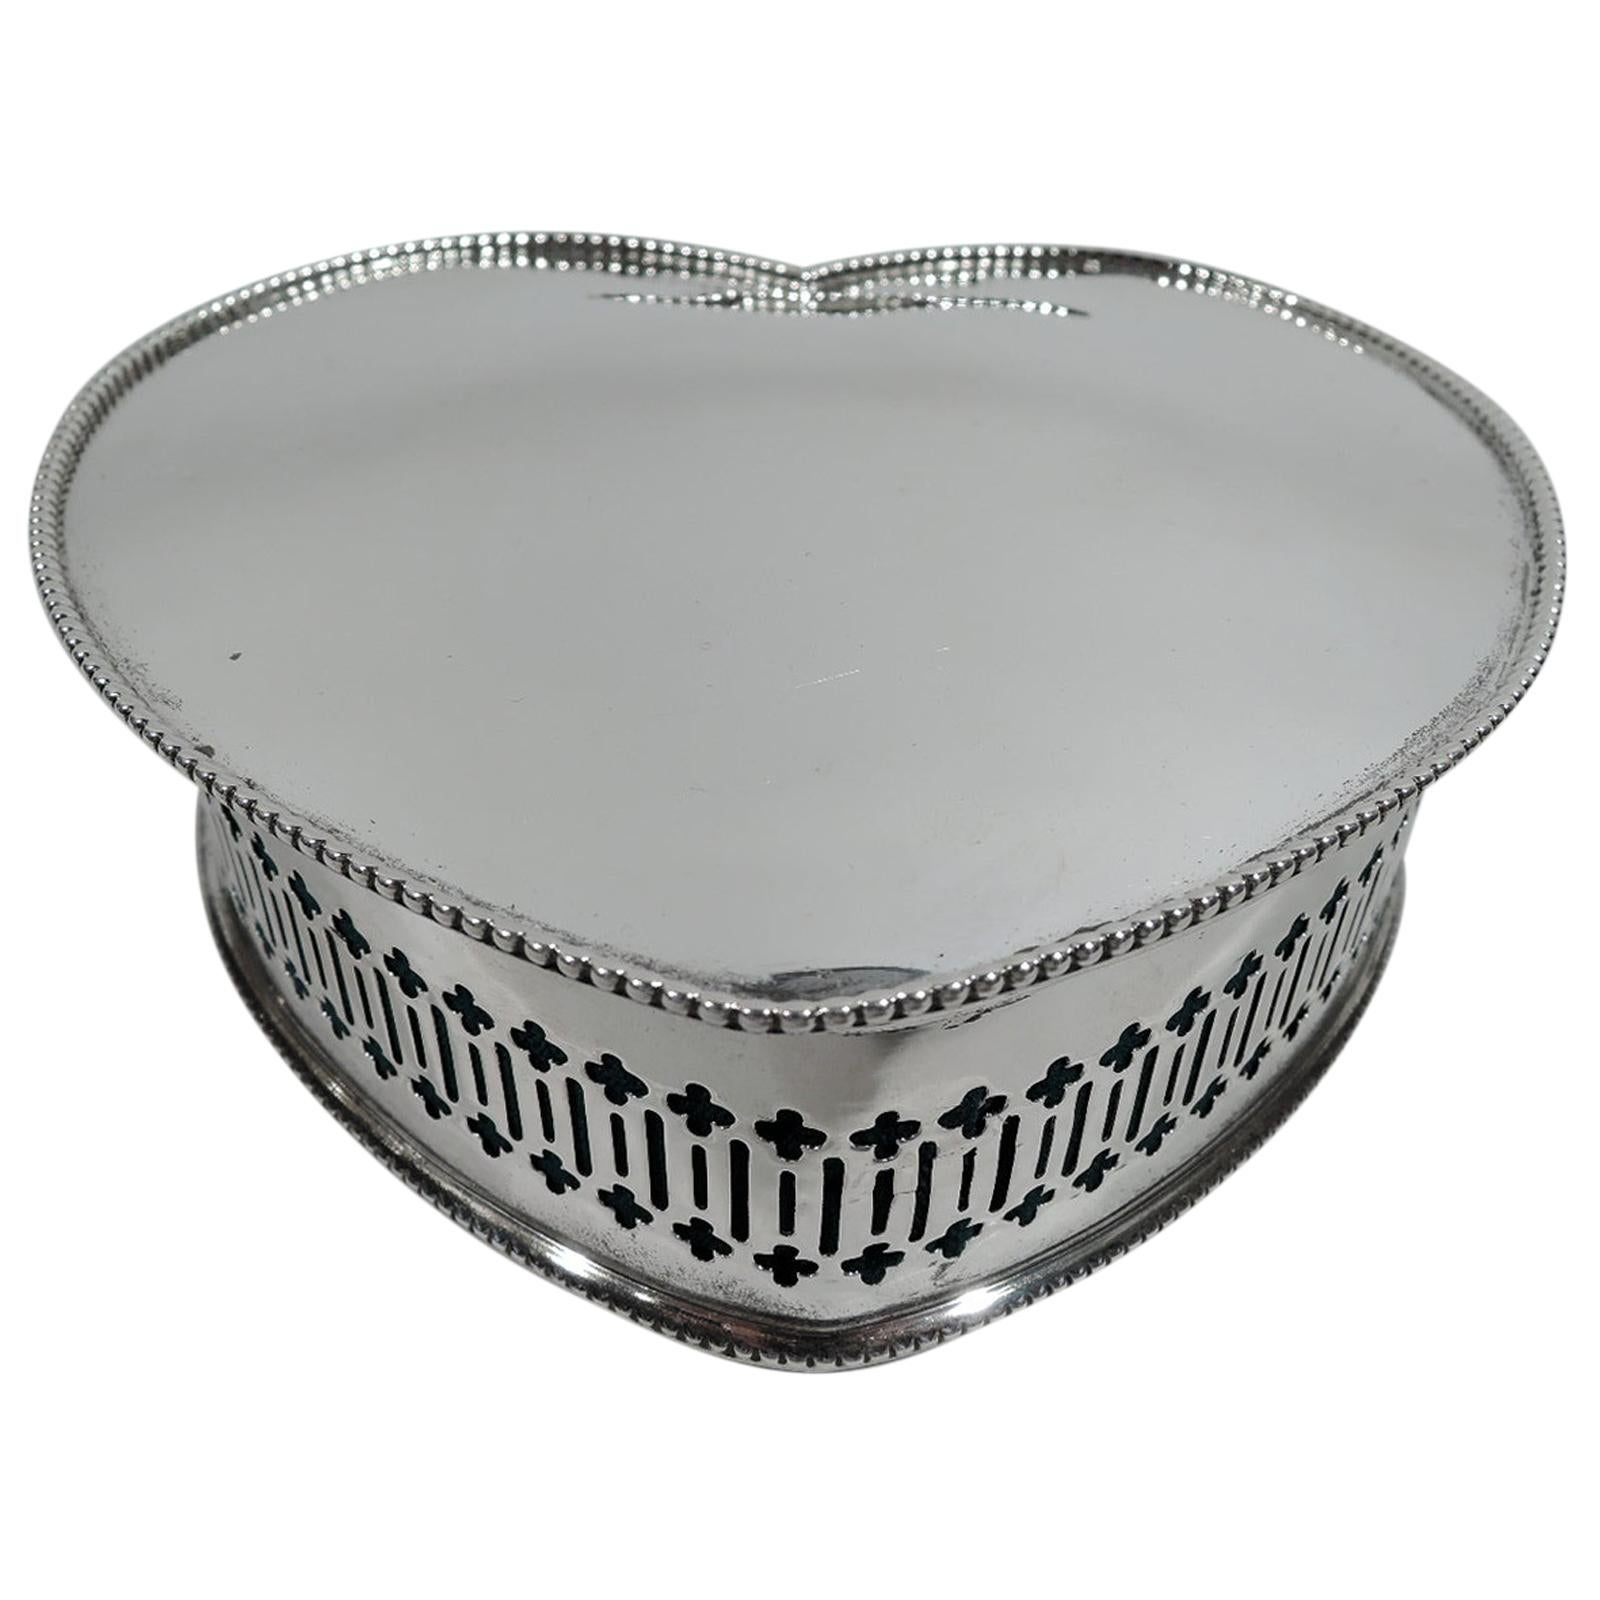 Antique Alvin Edwardian Sterling Silver Heart-Shaped Jewelry Box